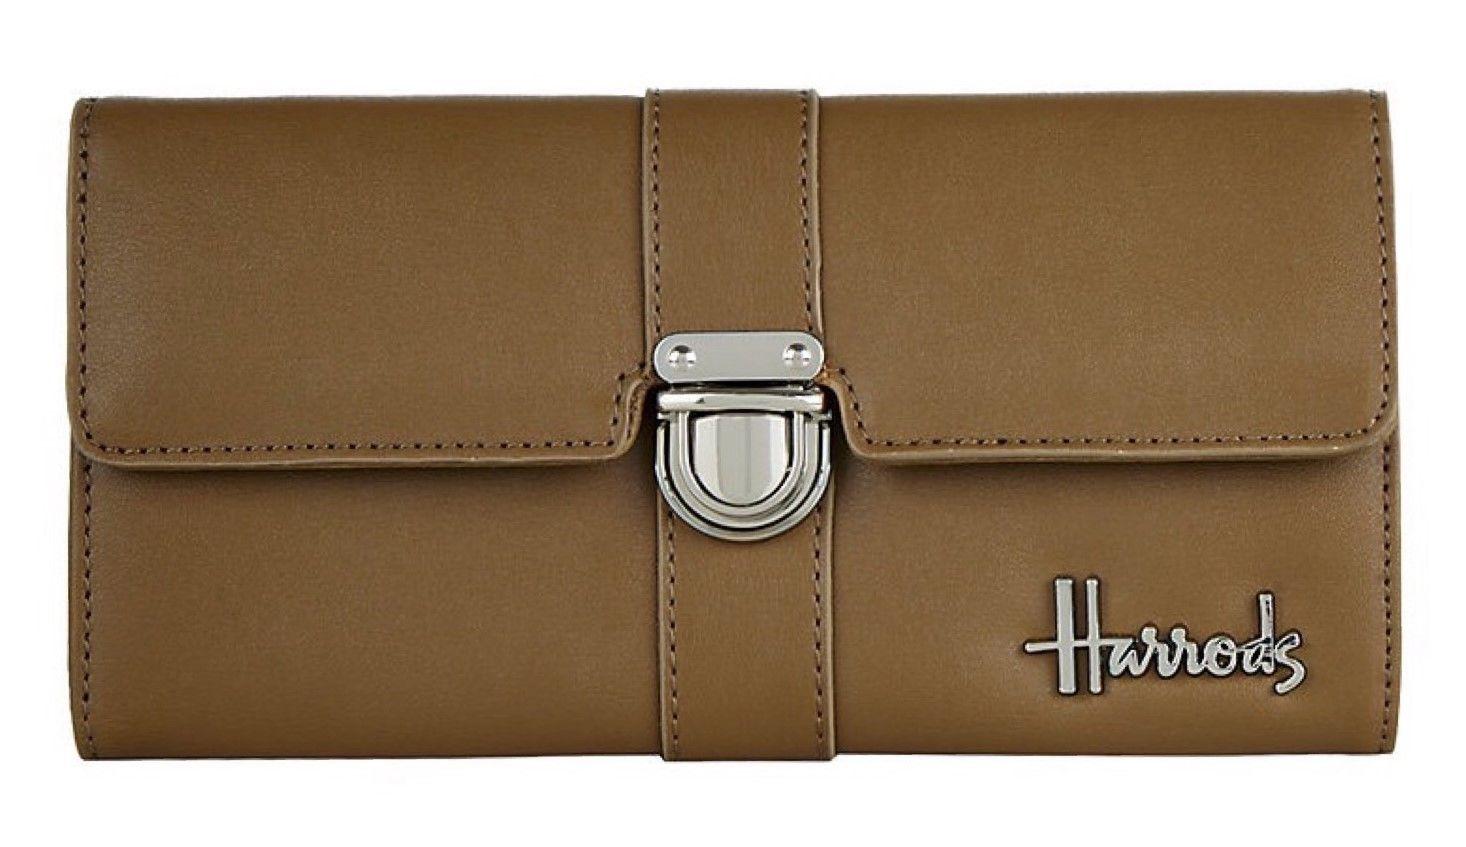 [Harrods] ハロッズ ウォレット / ノヴェッロ 財布 長財布 ロングウォレット (ライトブラウン)